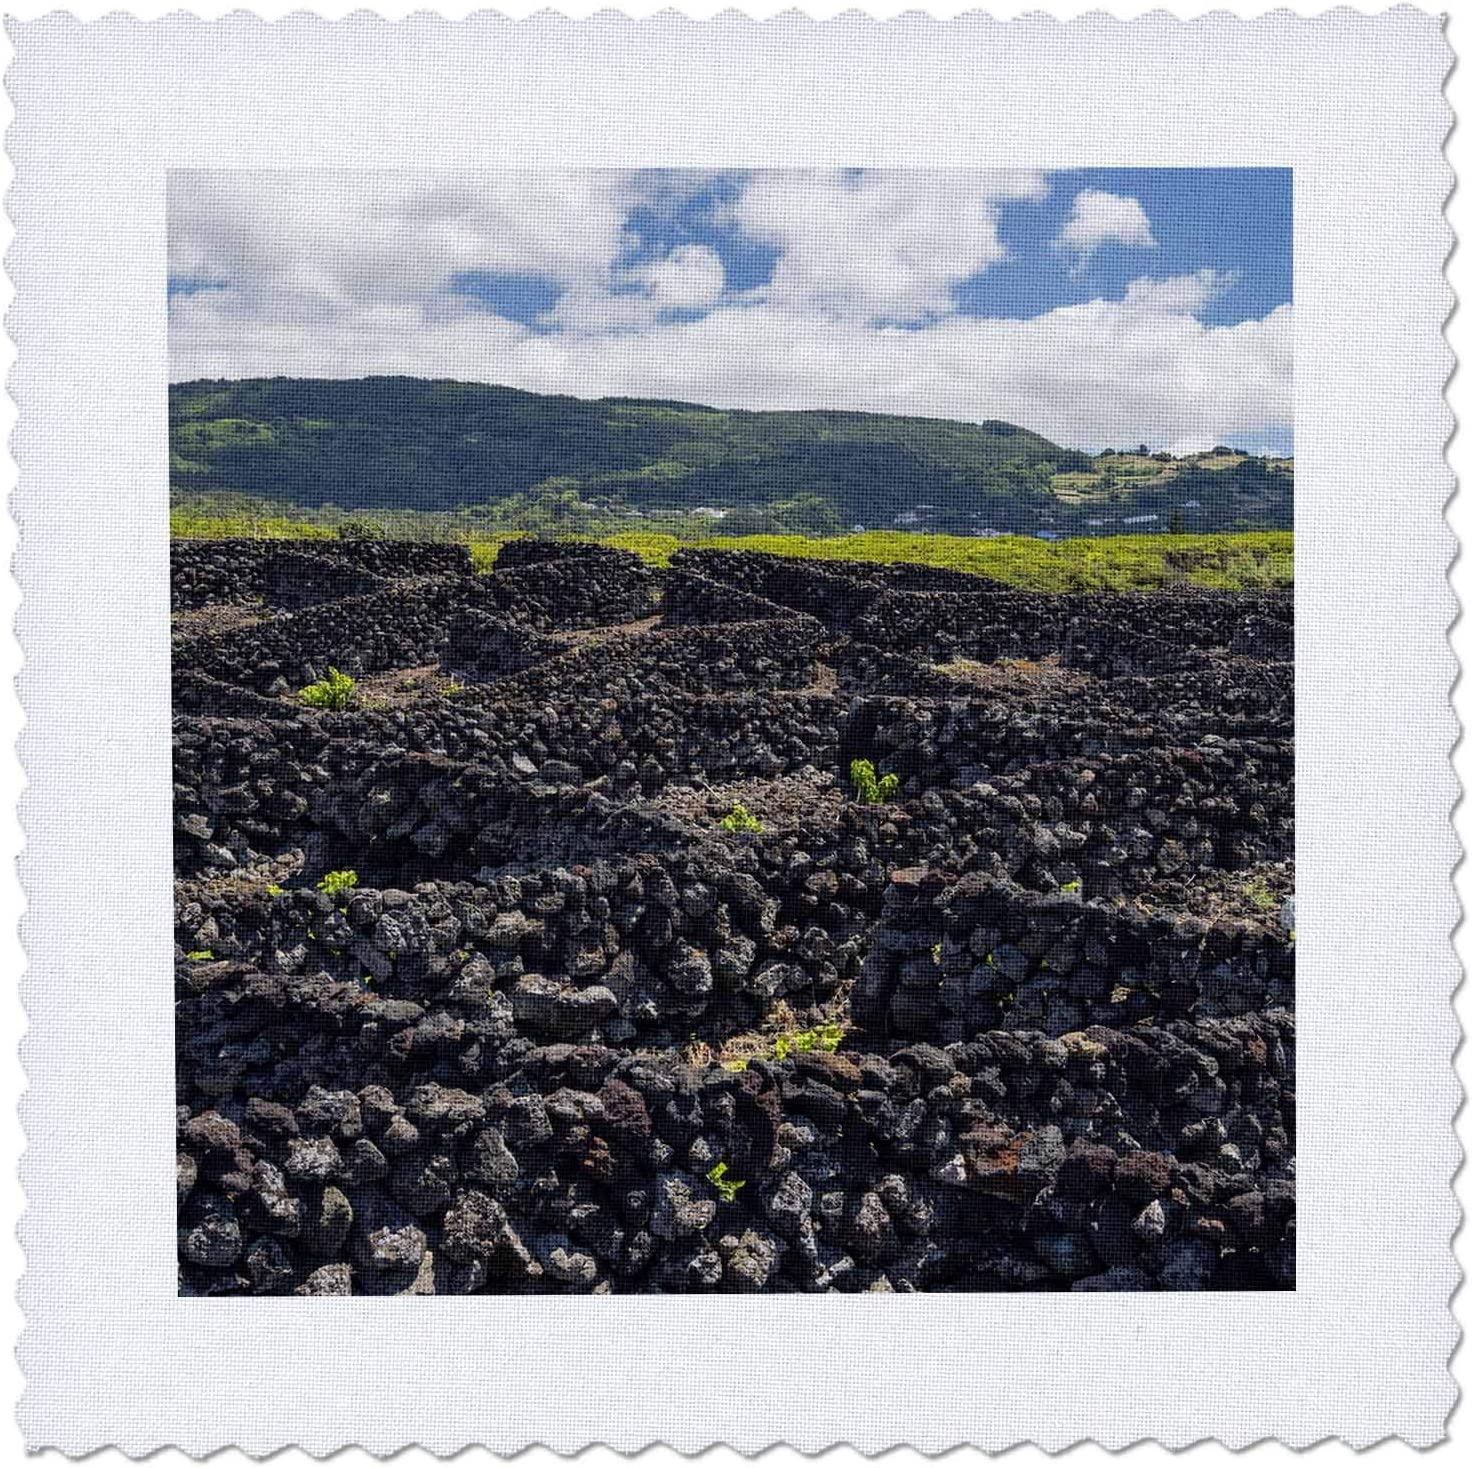 3dRose Danita Delimont - Portugal Q New 5% OFF life near Biscoitos. Vineyard